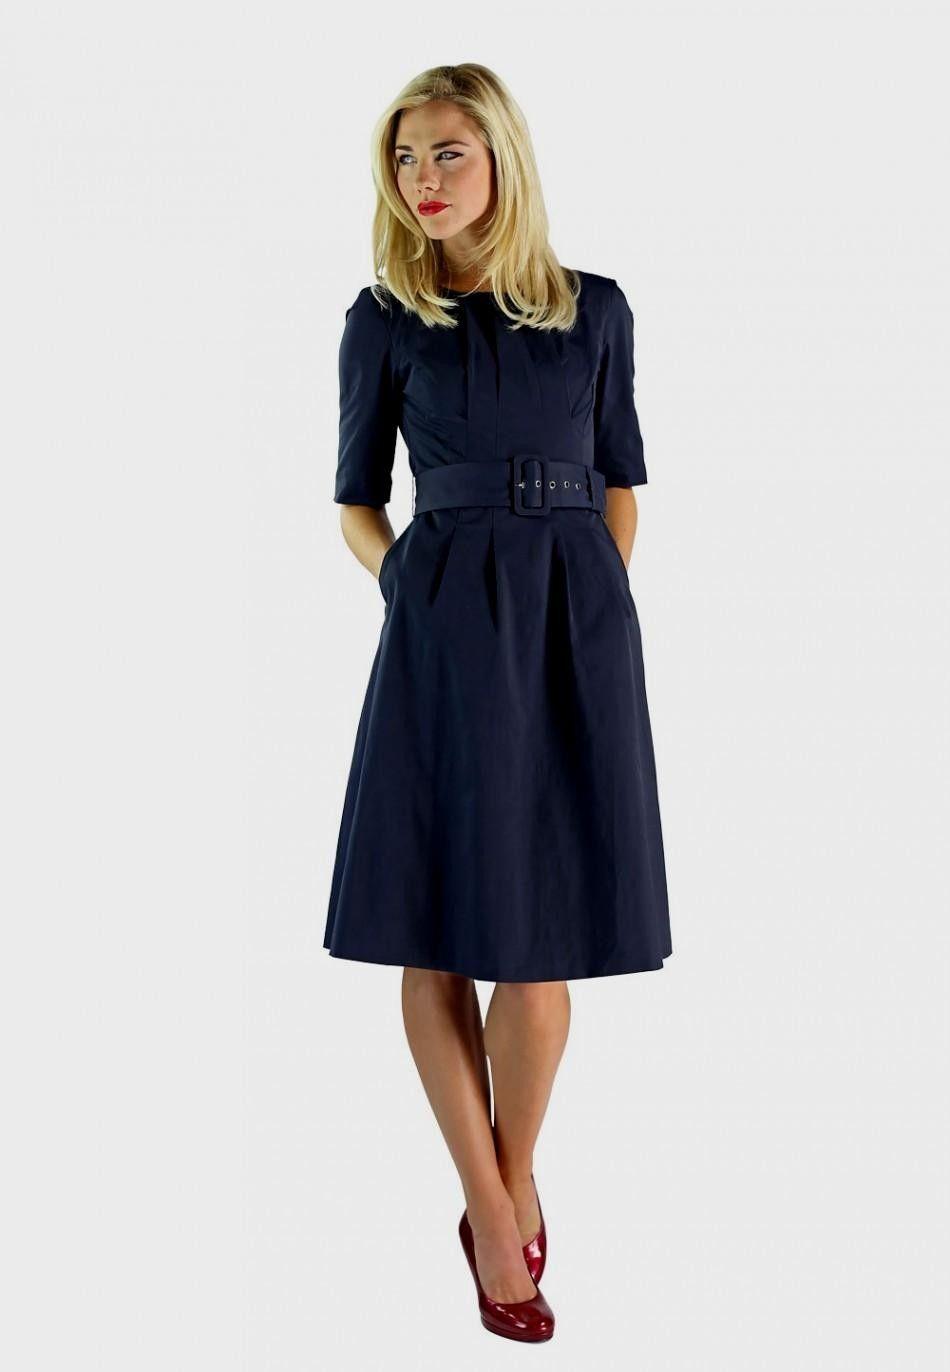 LDS Church Dresses